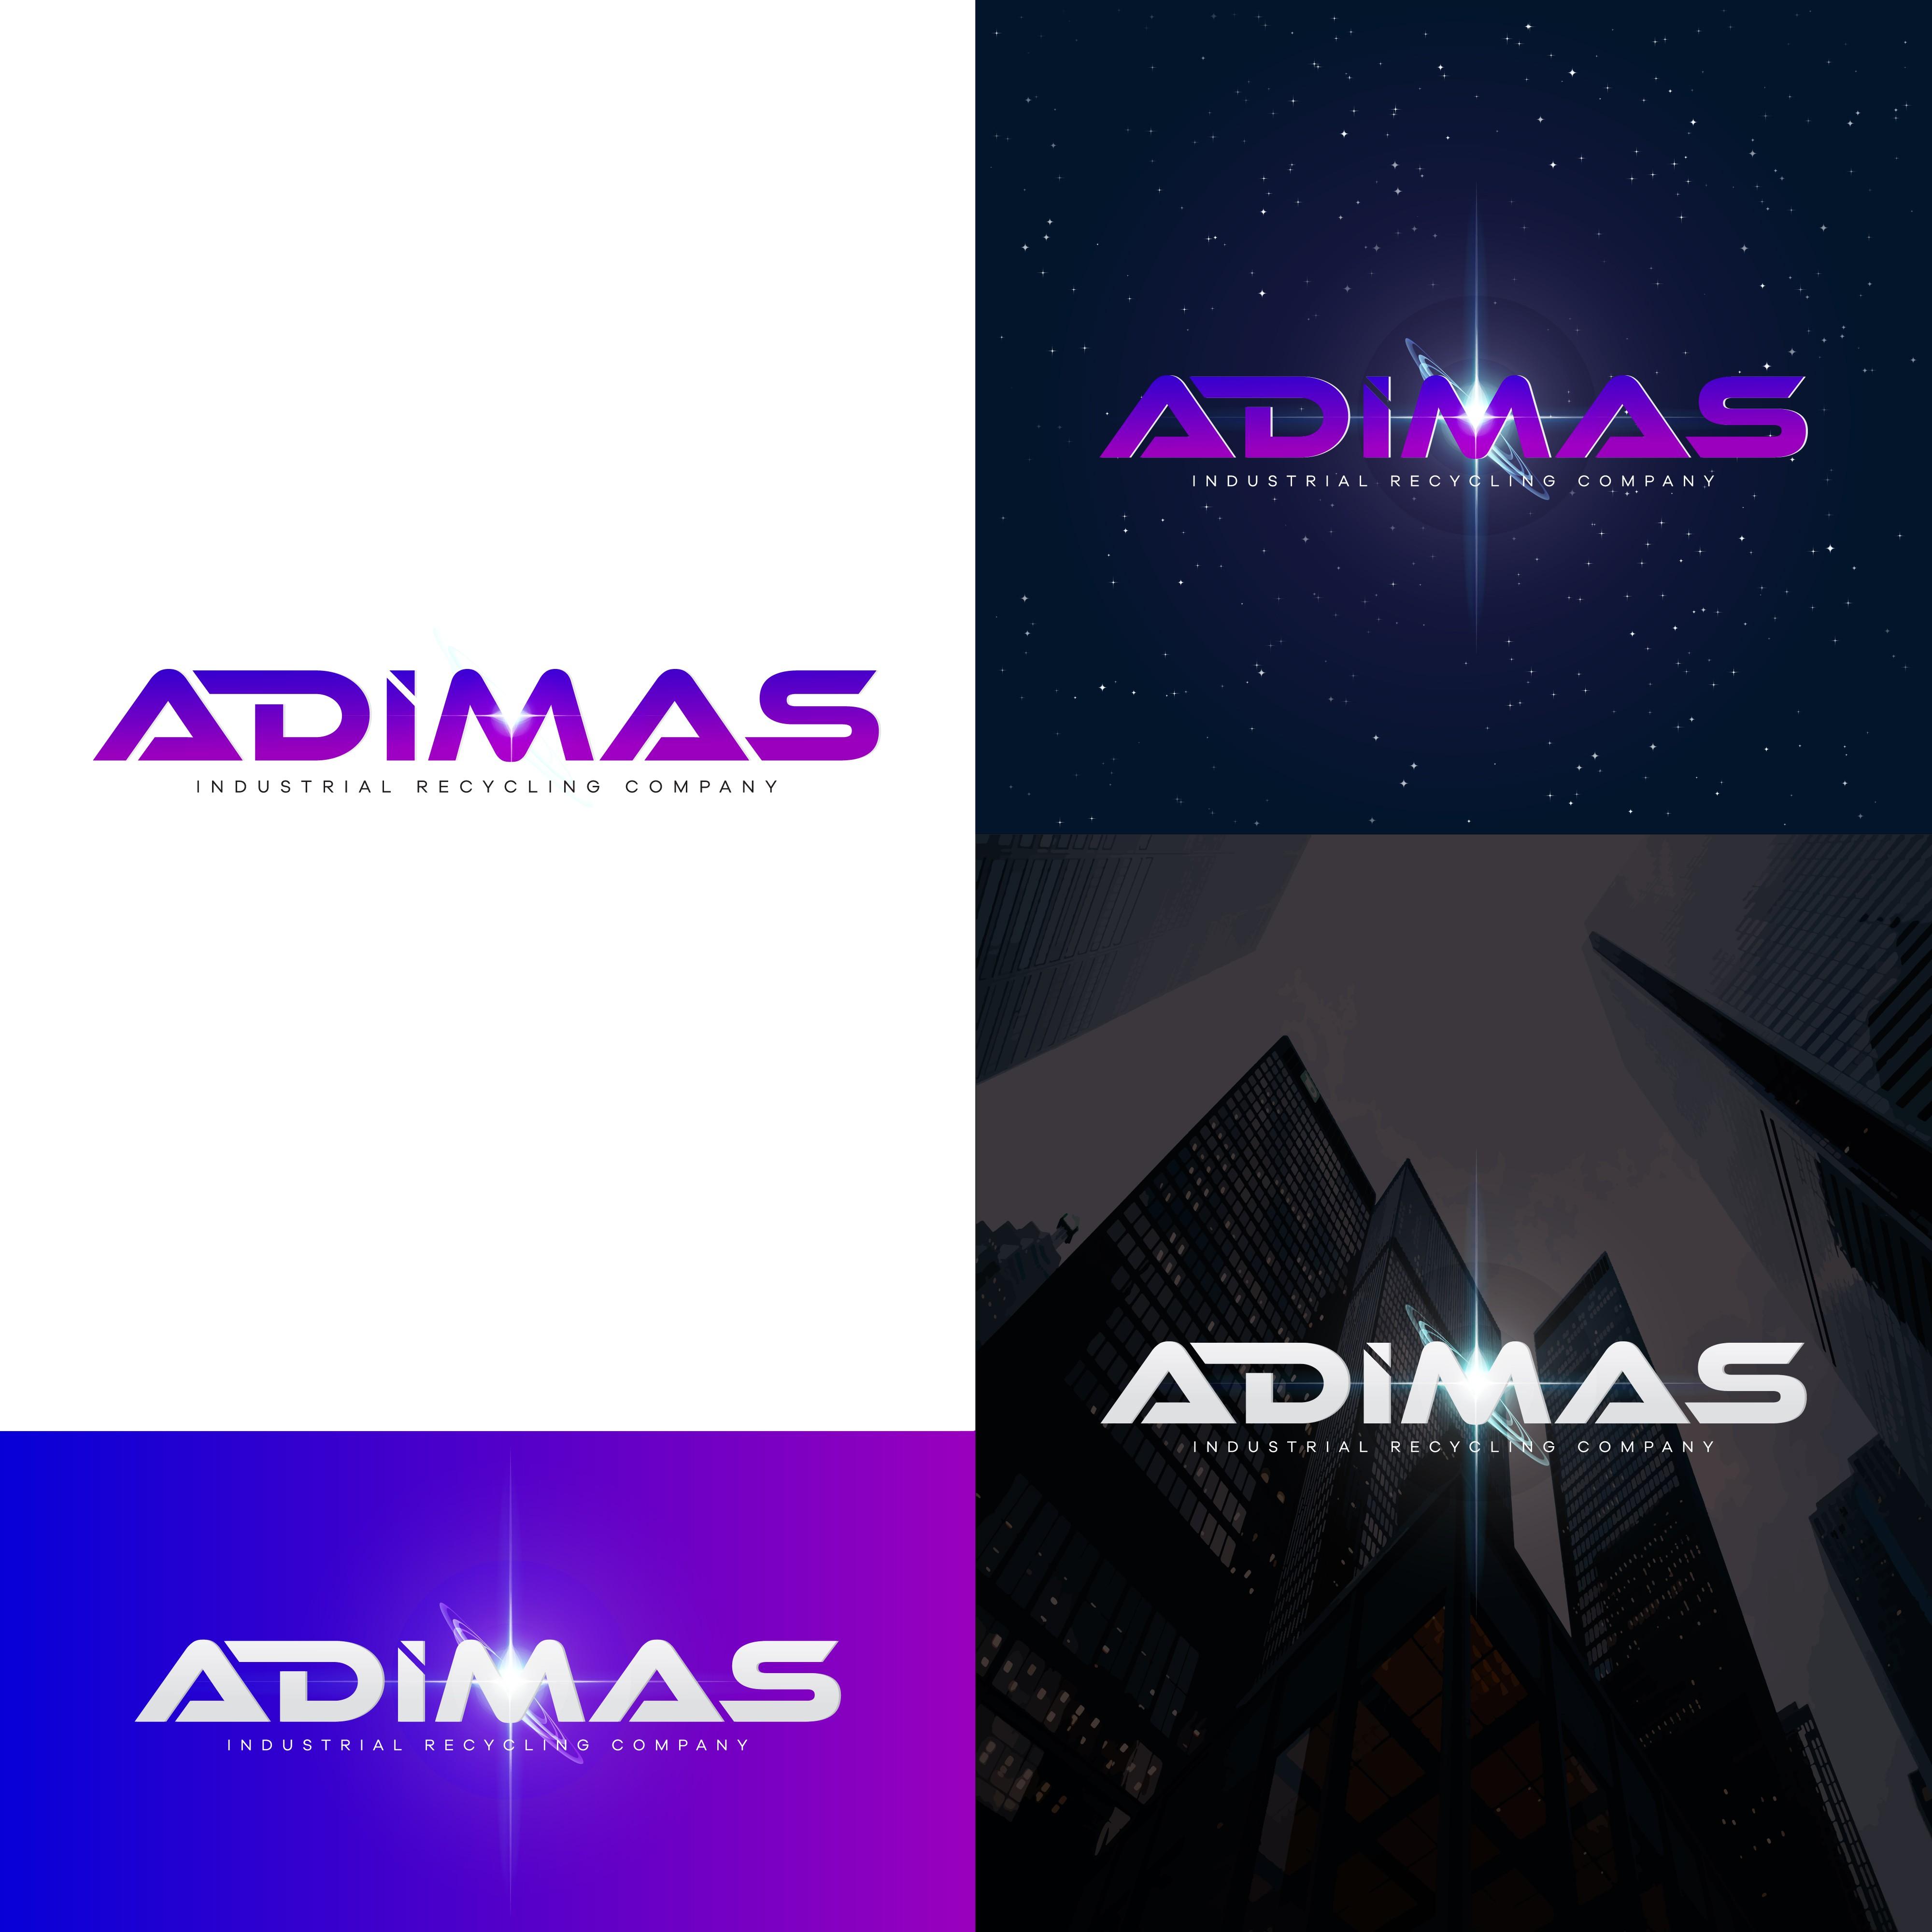 Logo Files from ADIMAS project